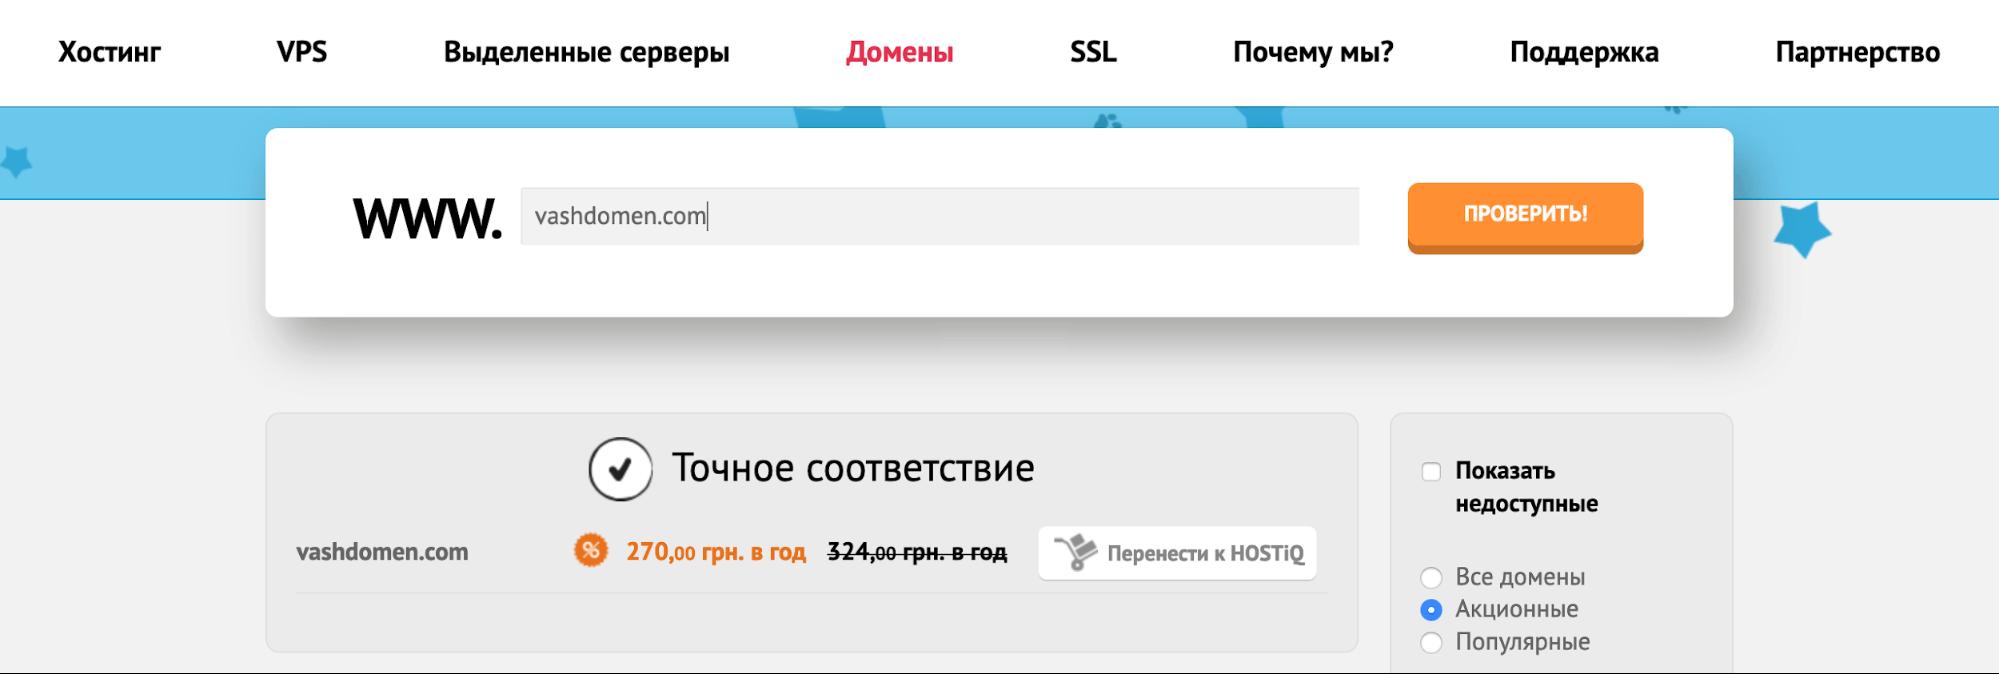 Страница заказа дрегистрации/переноса доменного имени на HOSTiQ